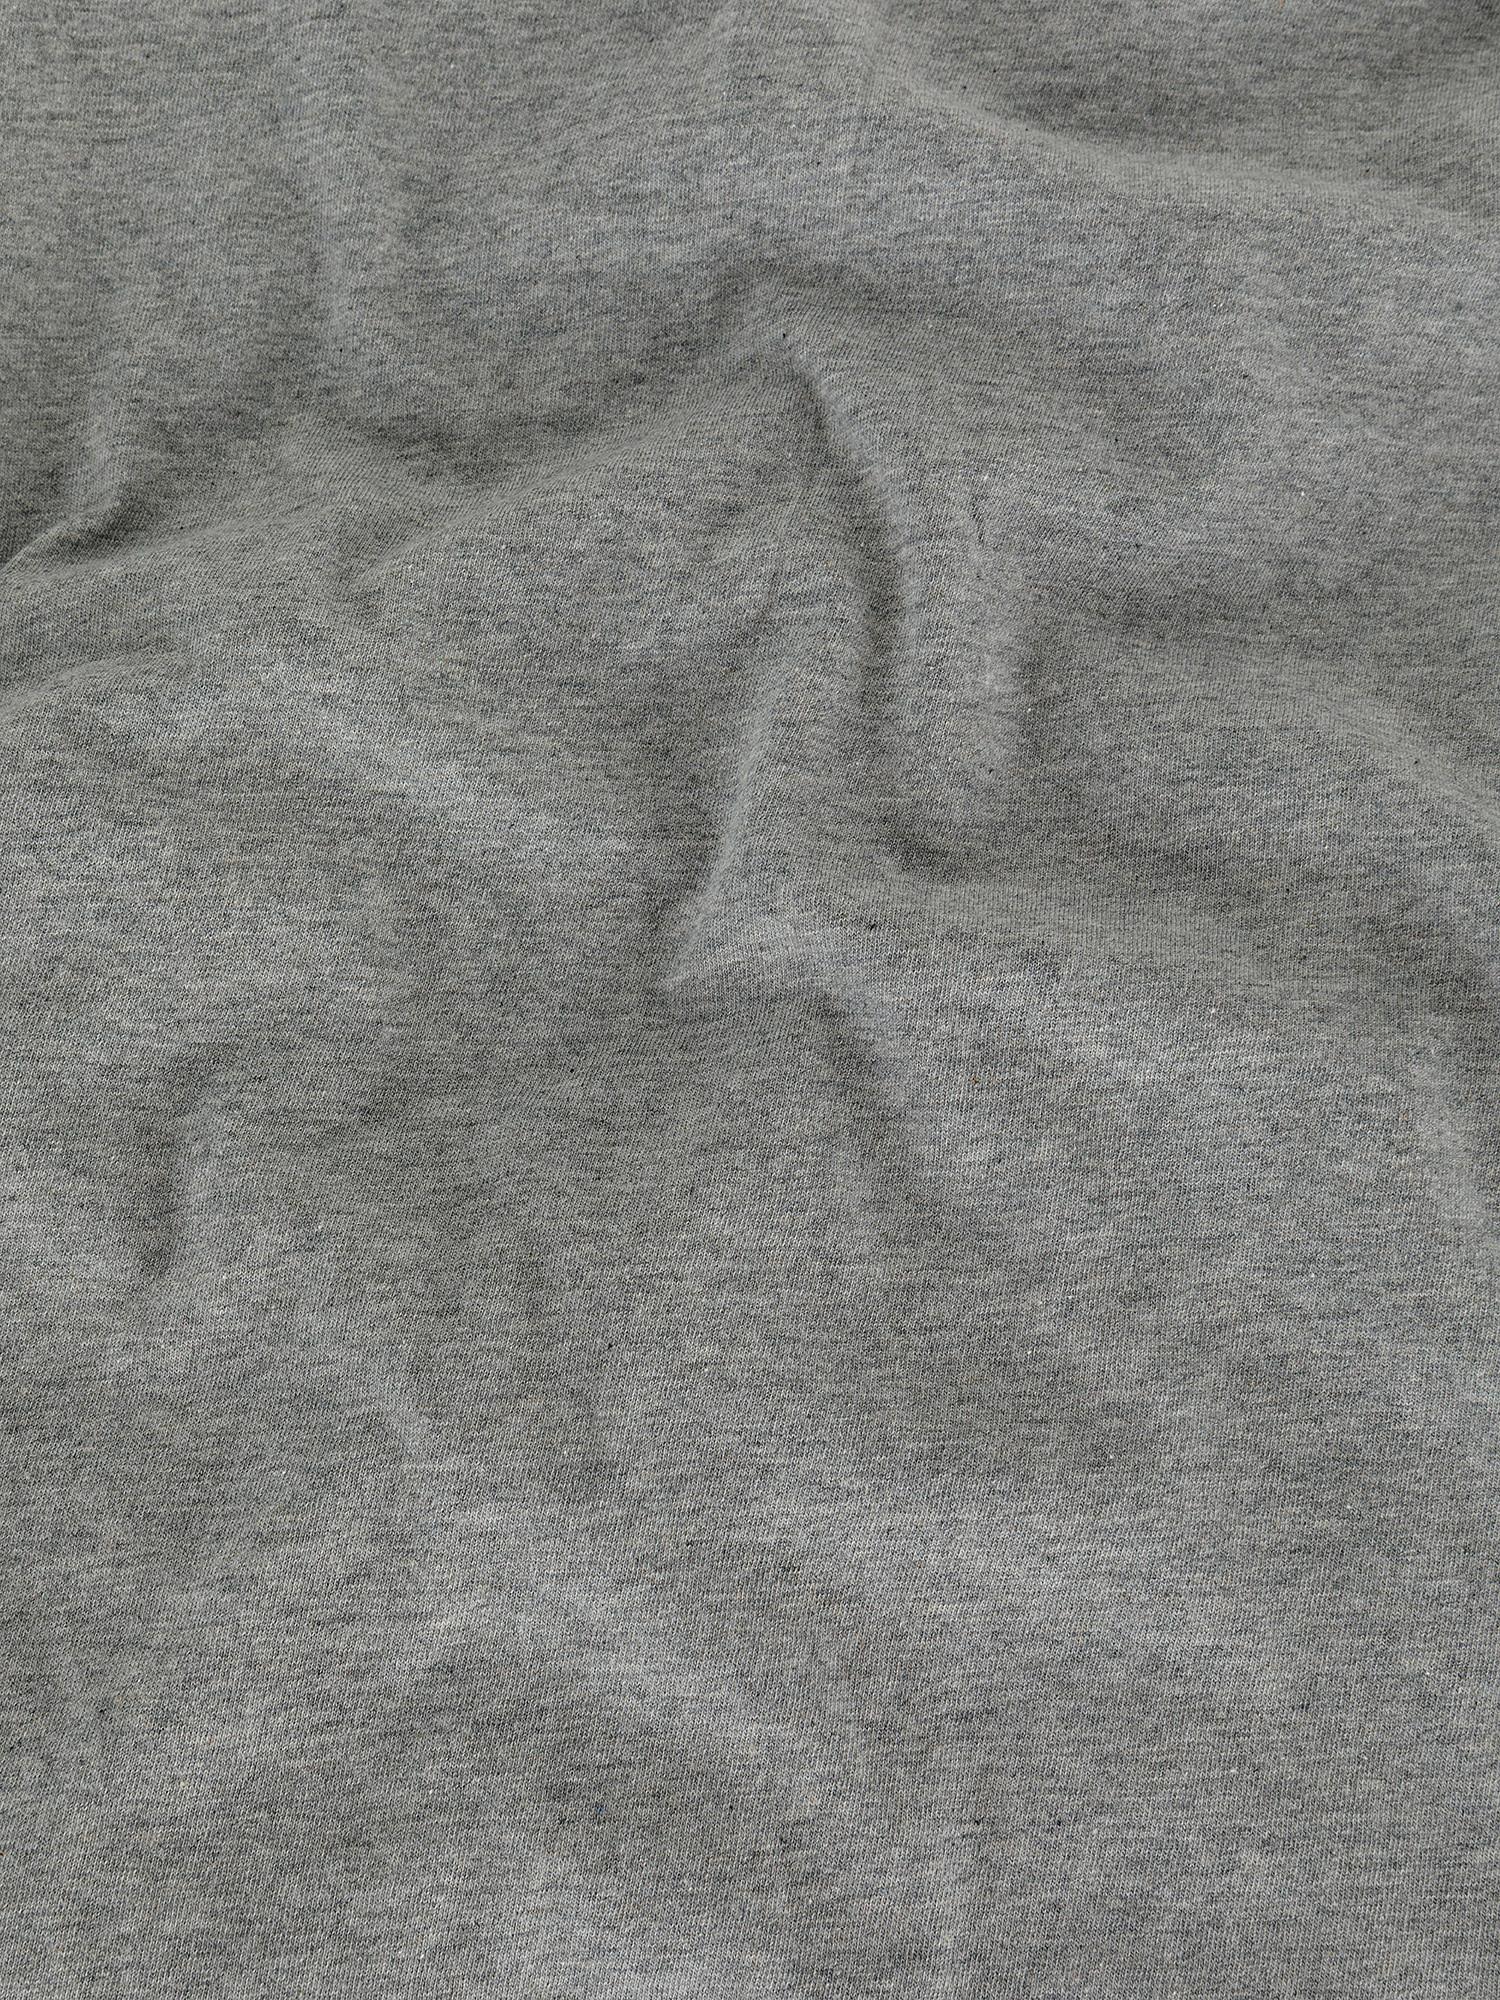 Parure copripiumino jersey di cotone tinta unita, Grigio, large image number 2